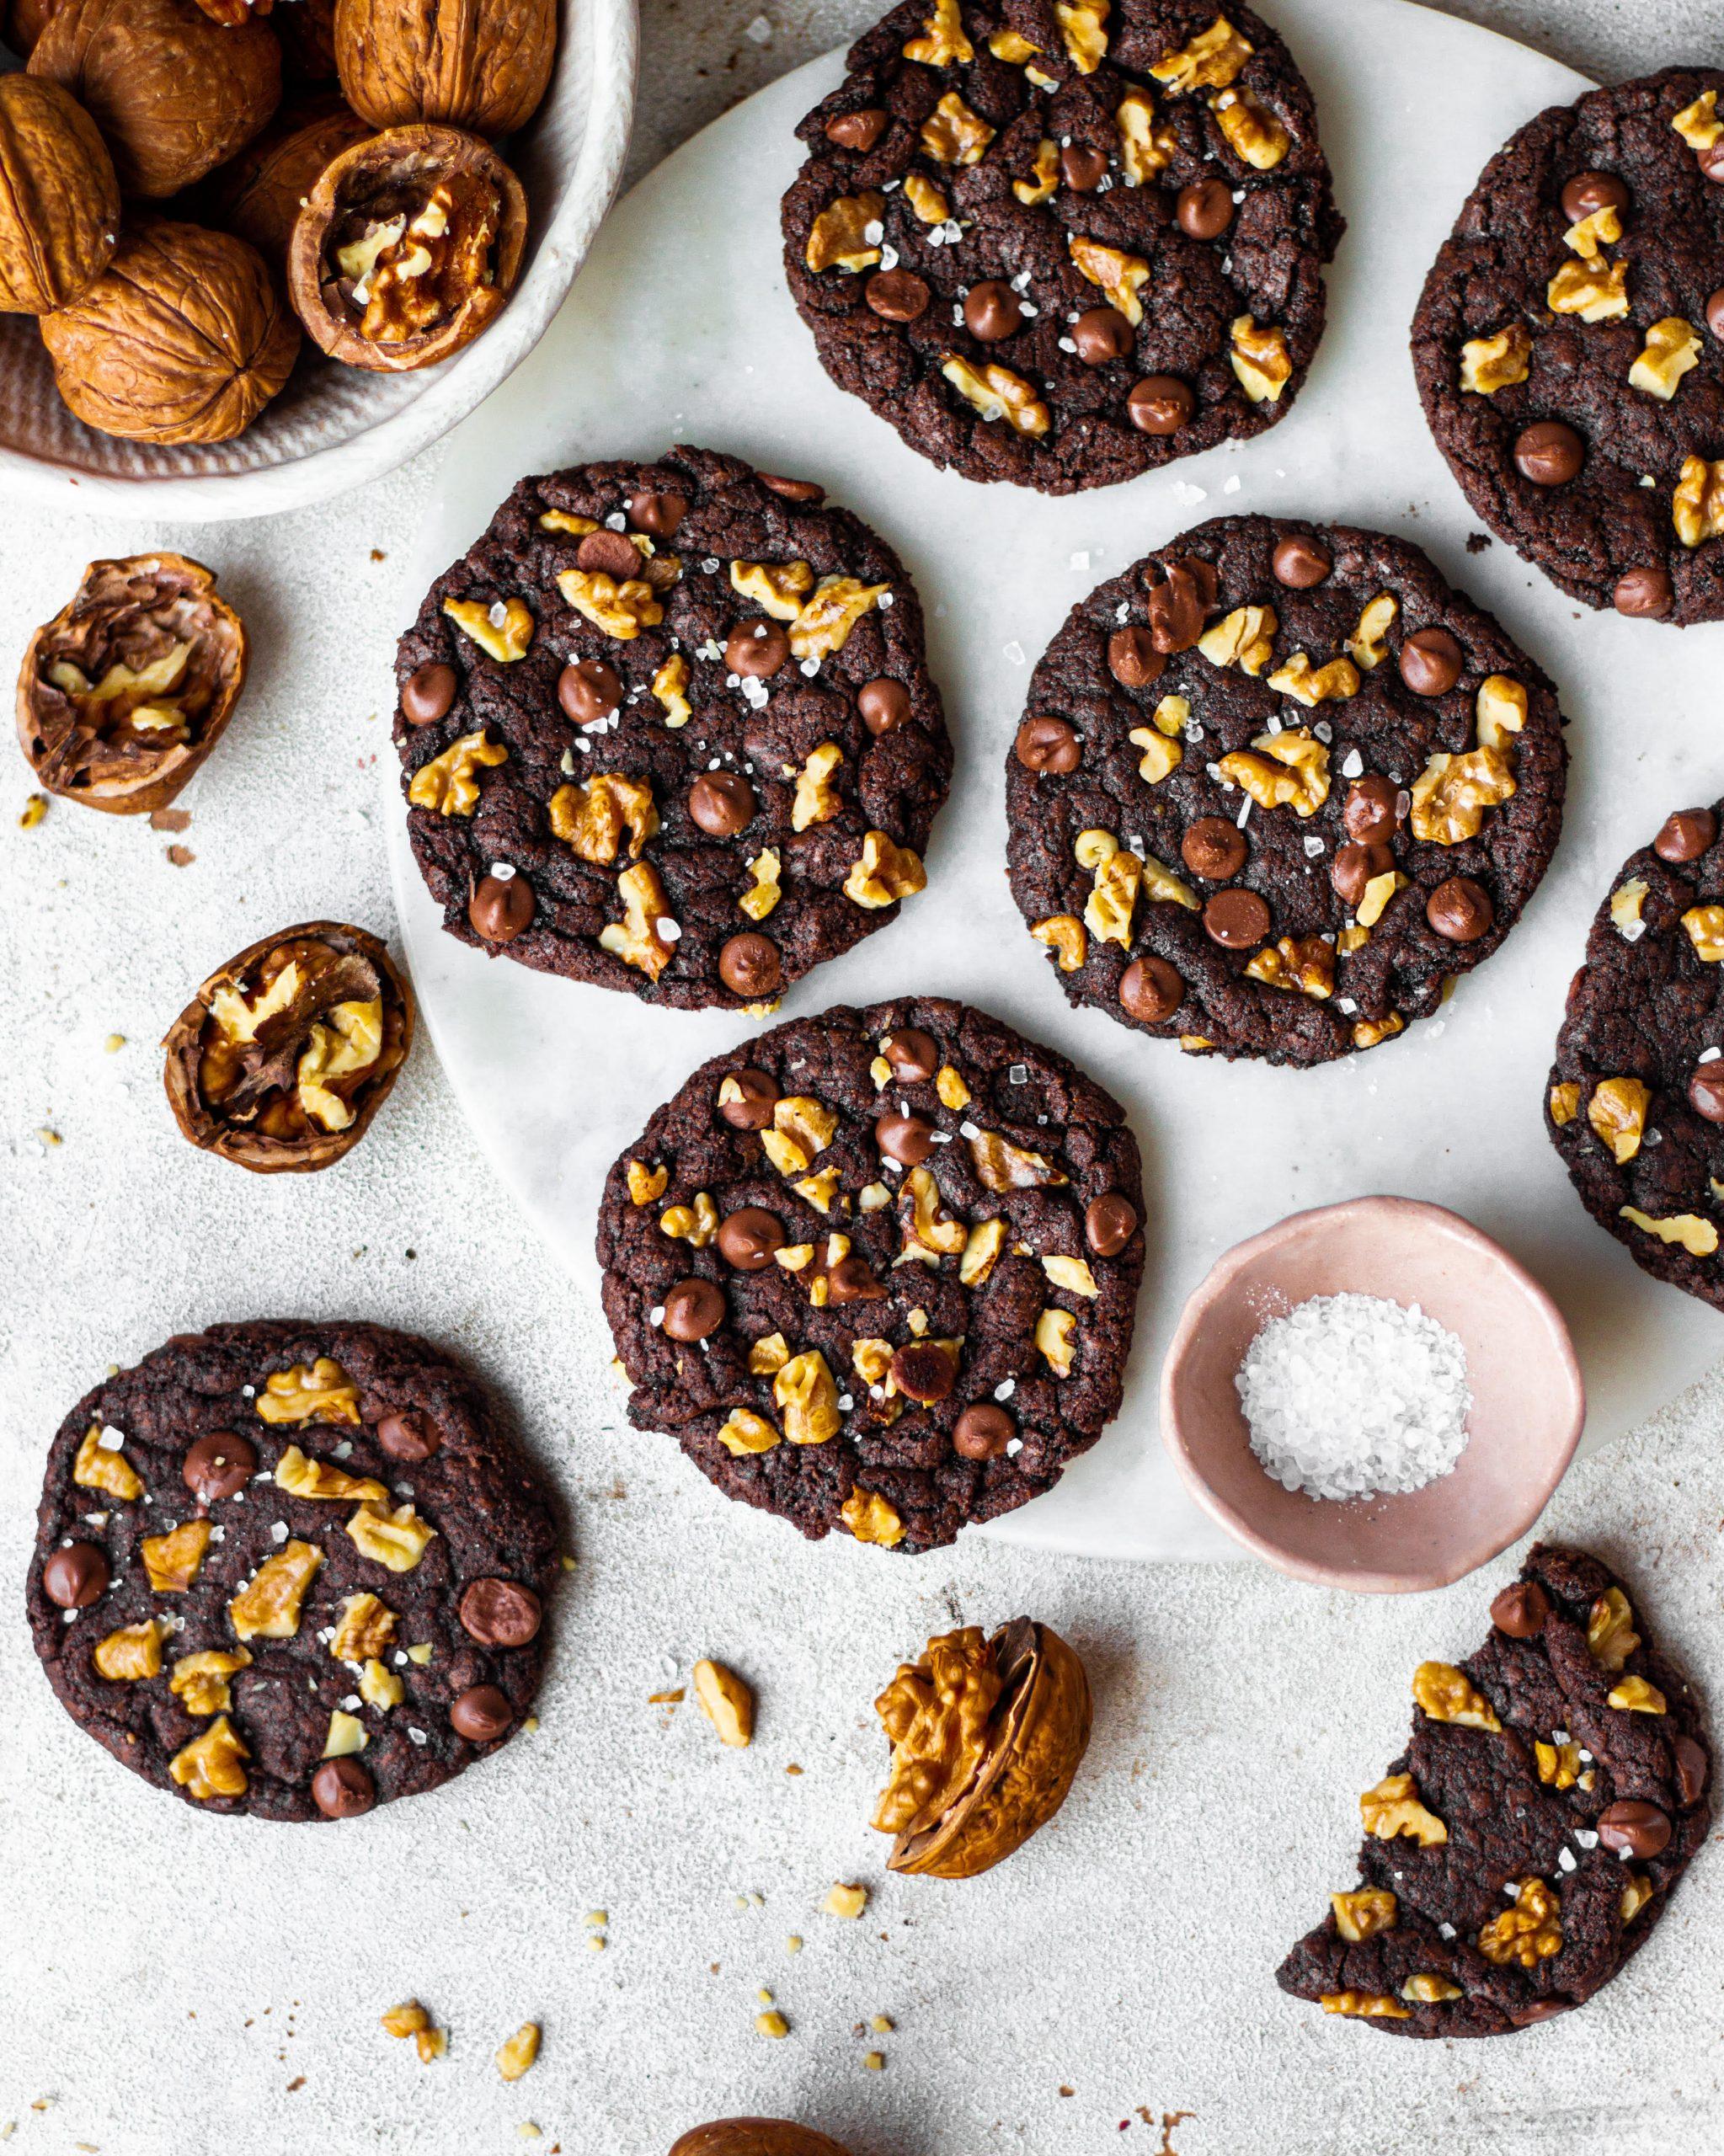 Walnut mocha cookies